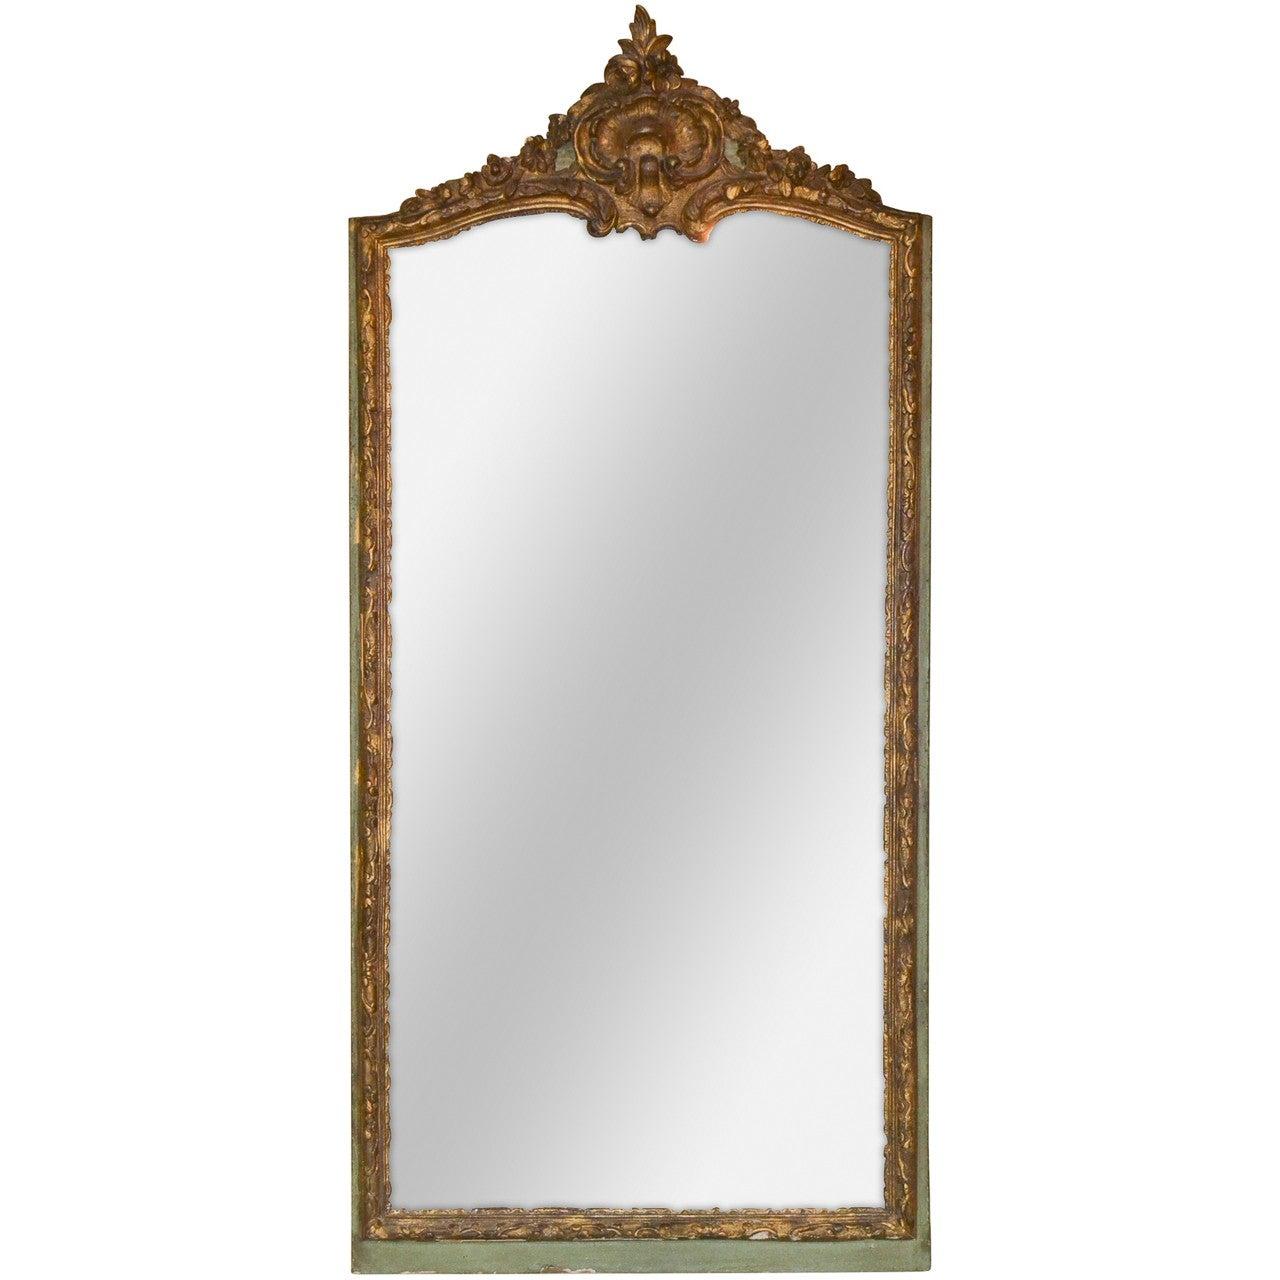 18th Century French Regence Parcel Gilt Mirror